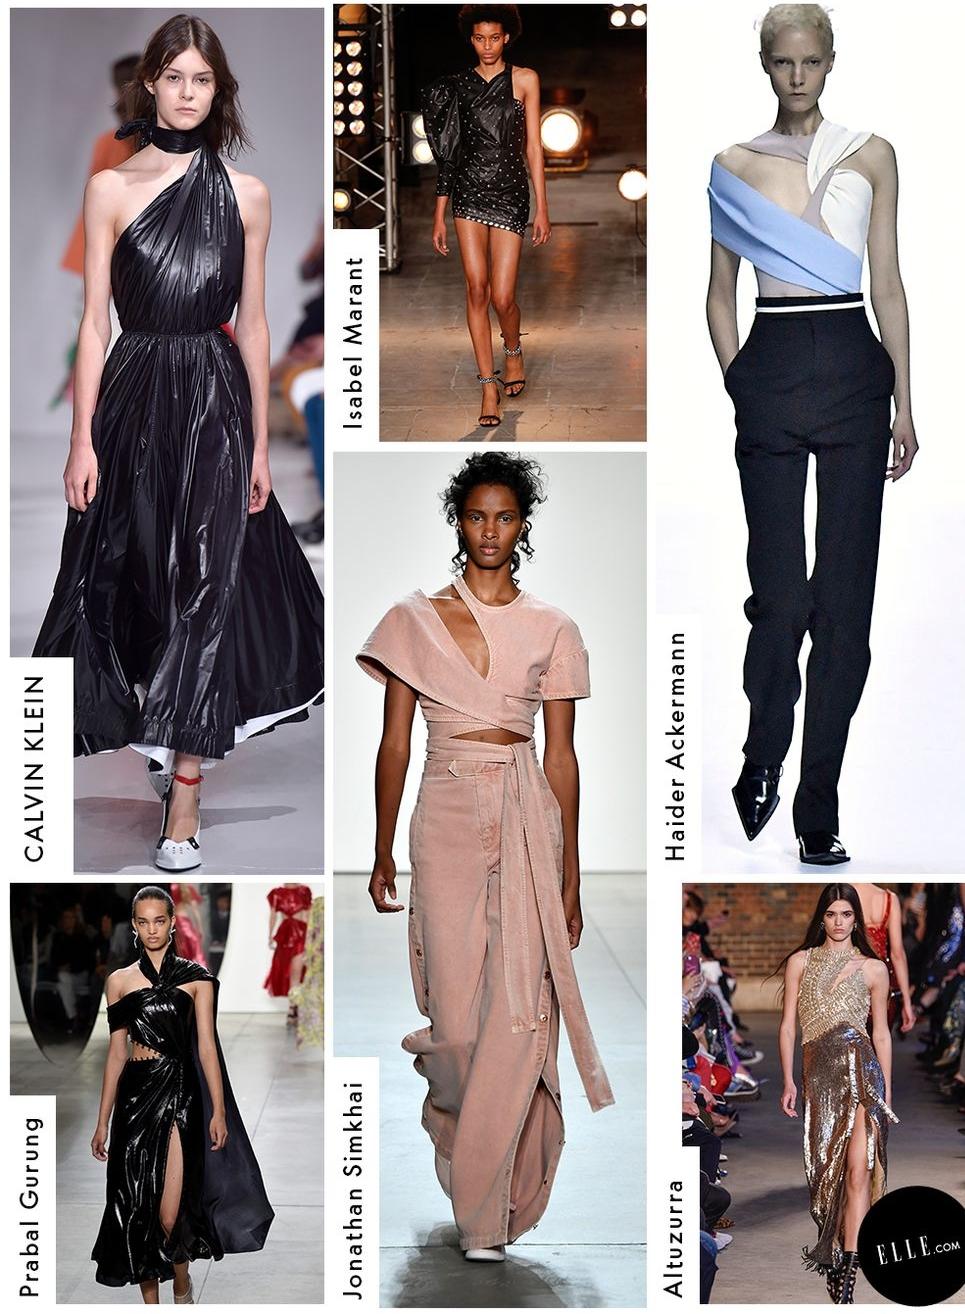 Image courtesy of Elle.com